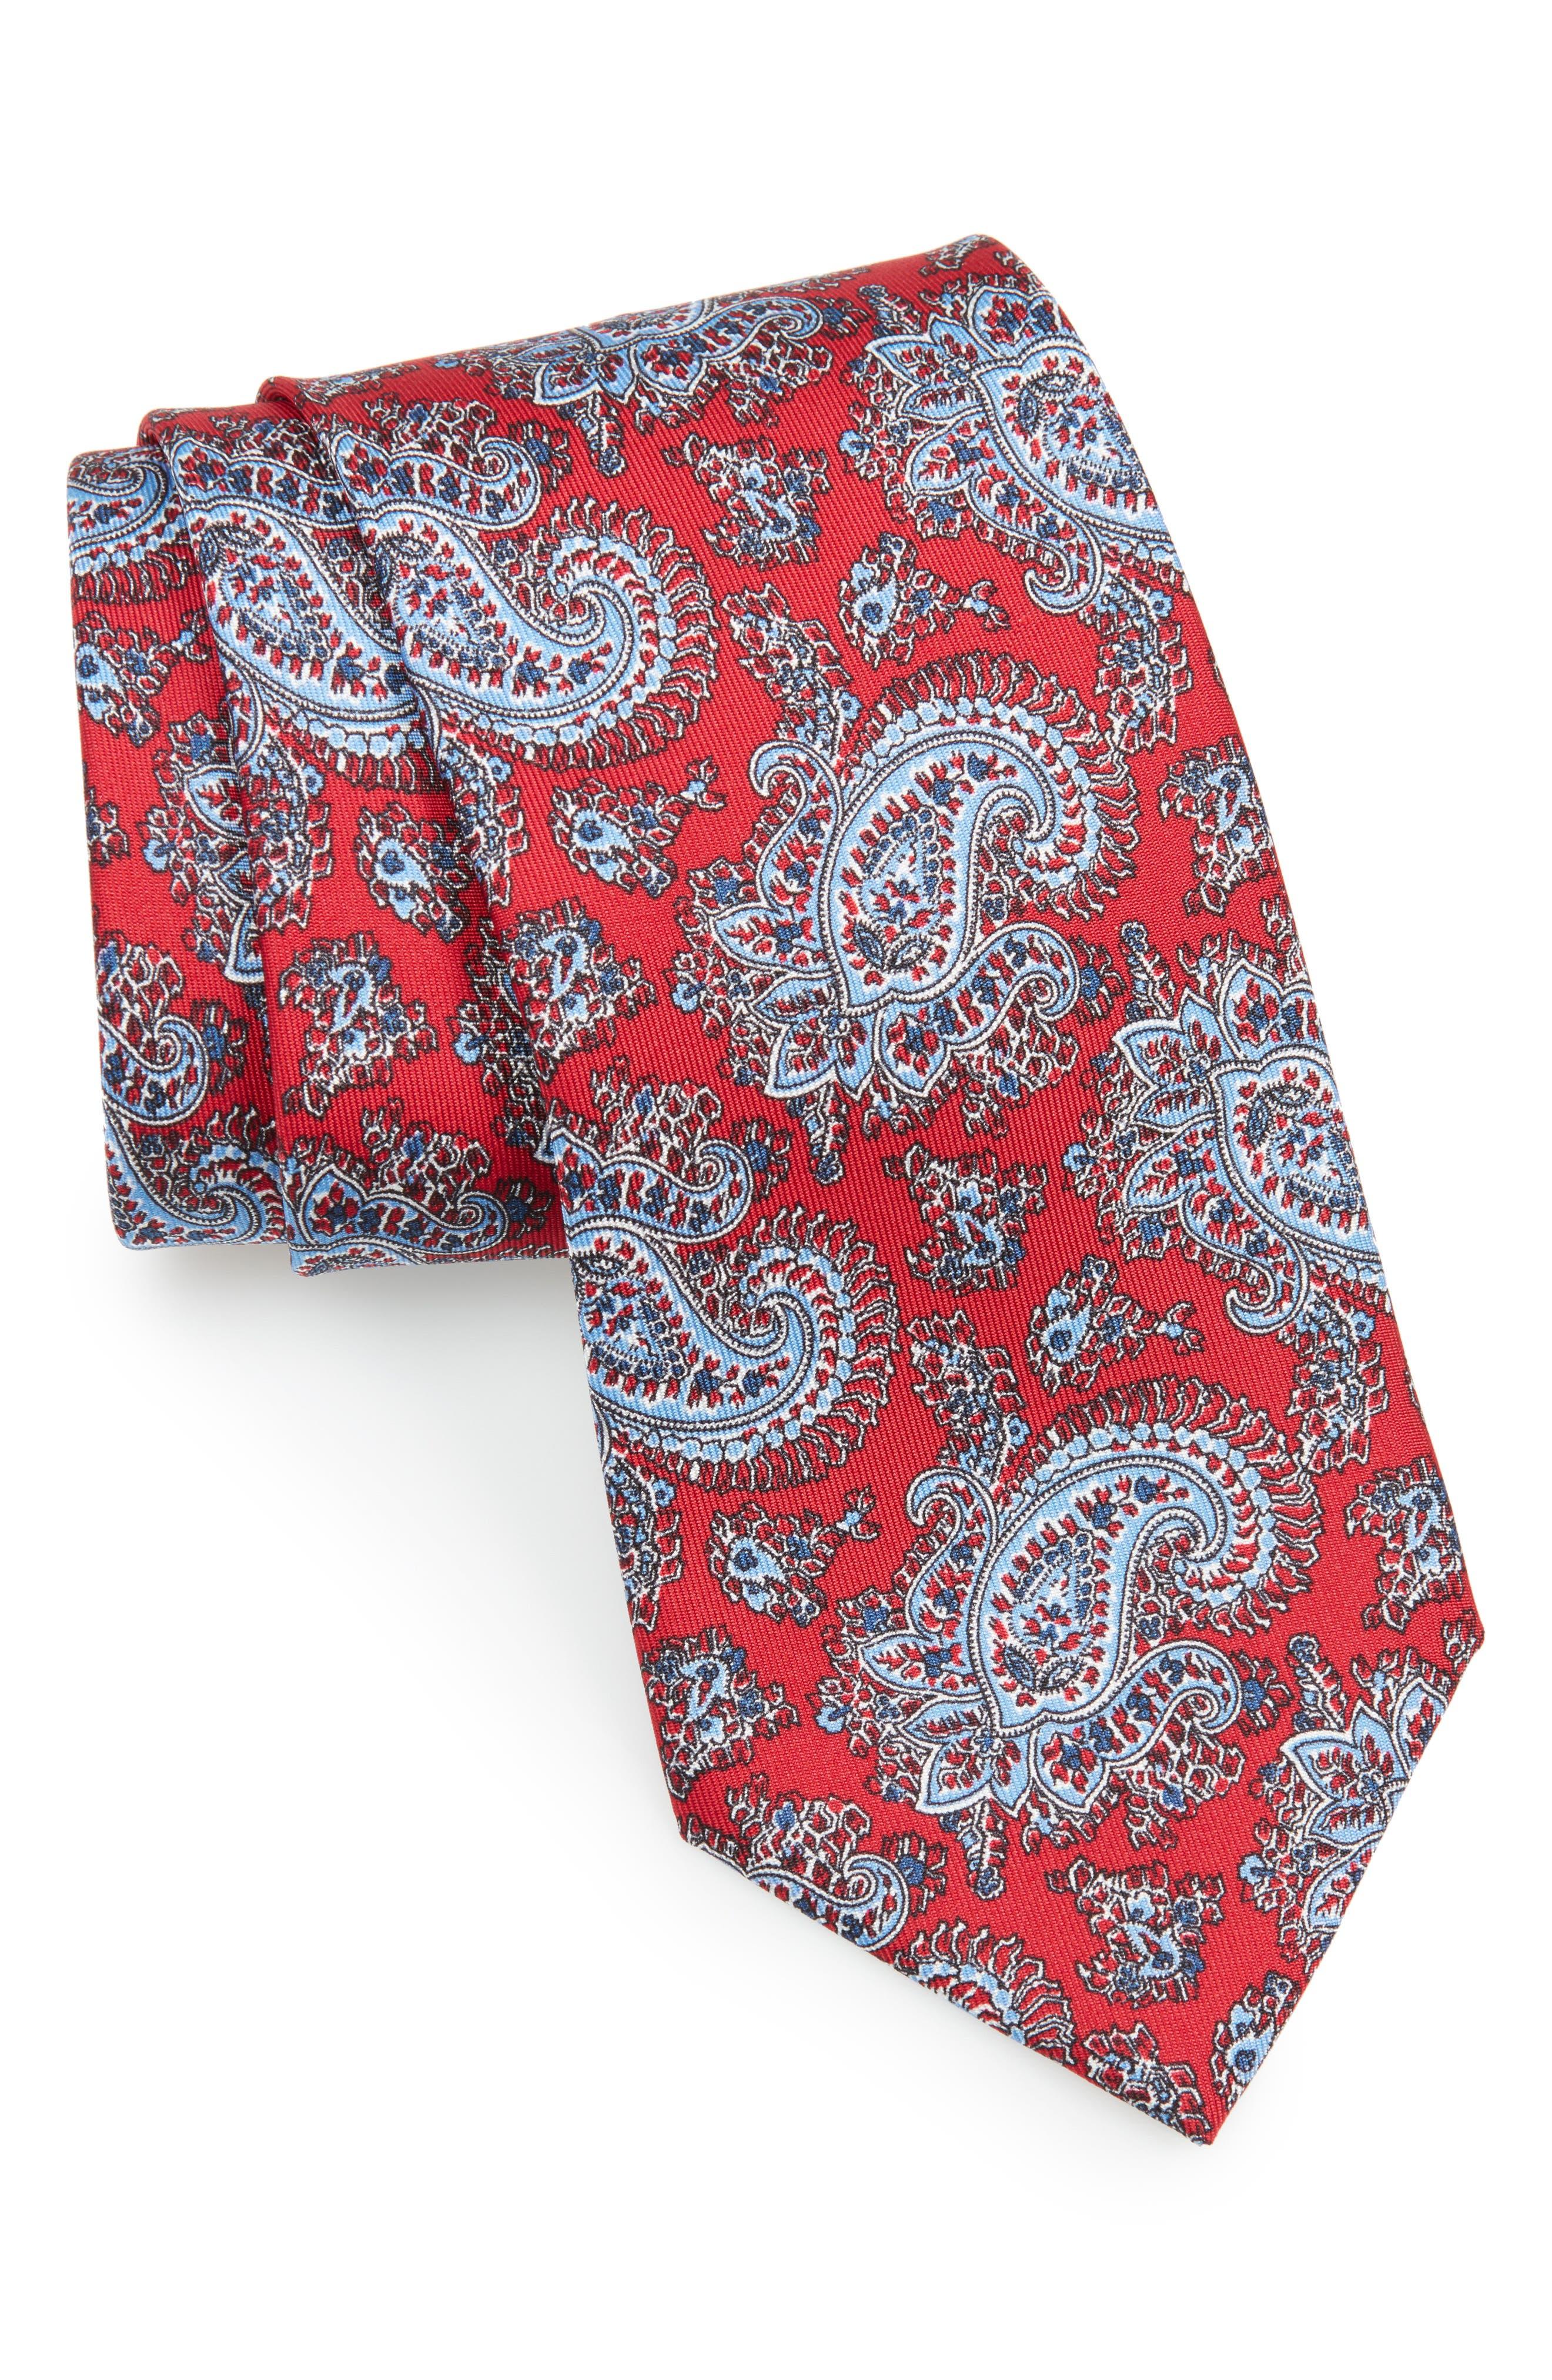 Alternate Image 1 Selected - Brioni Paisley Silk Tie